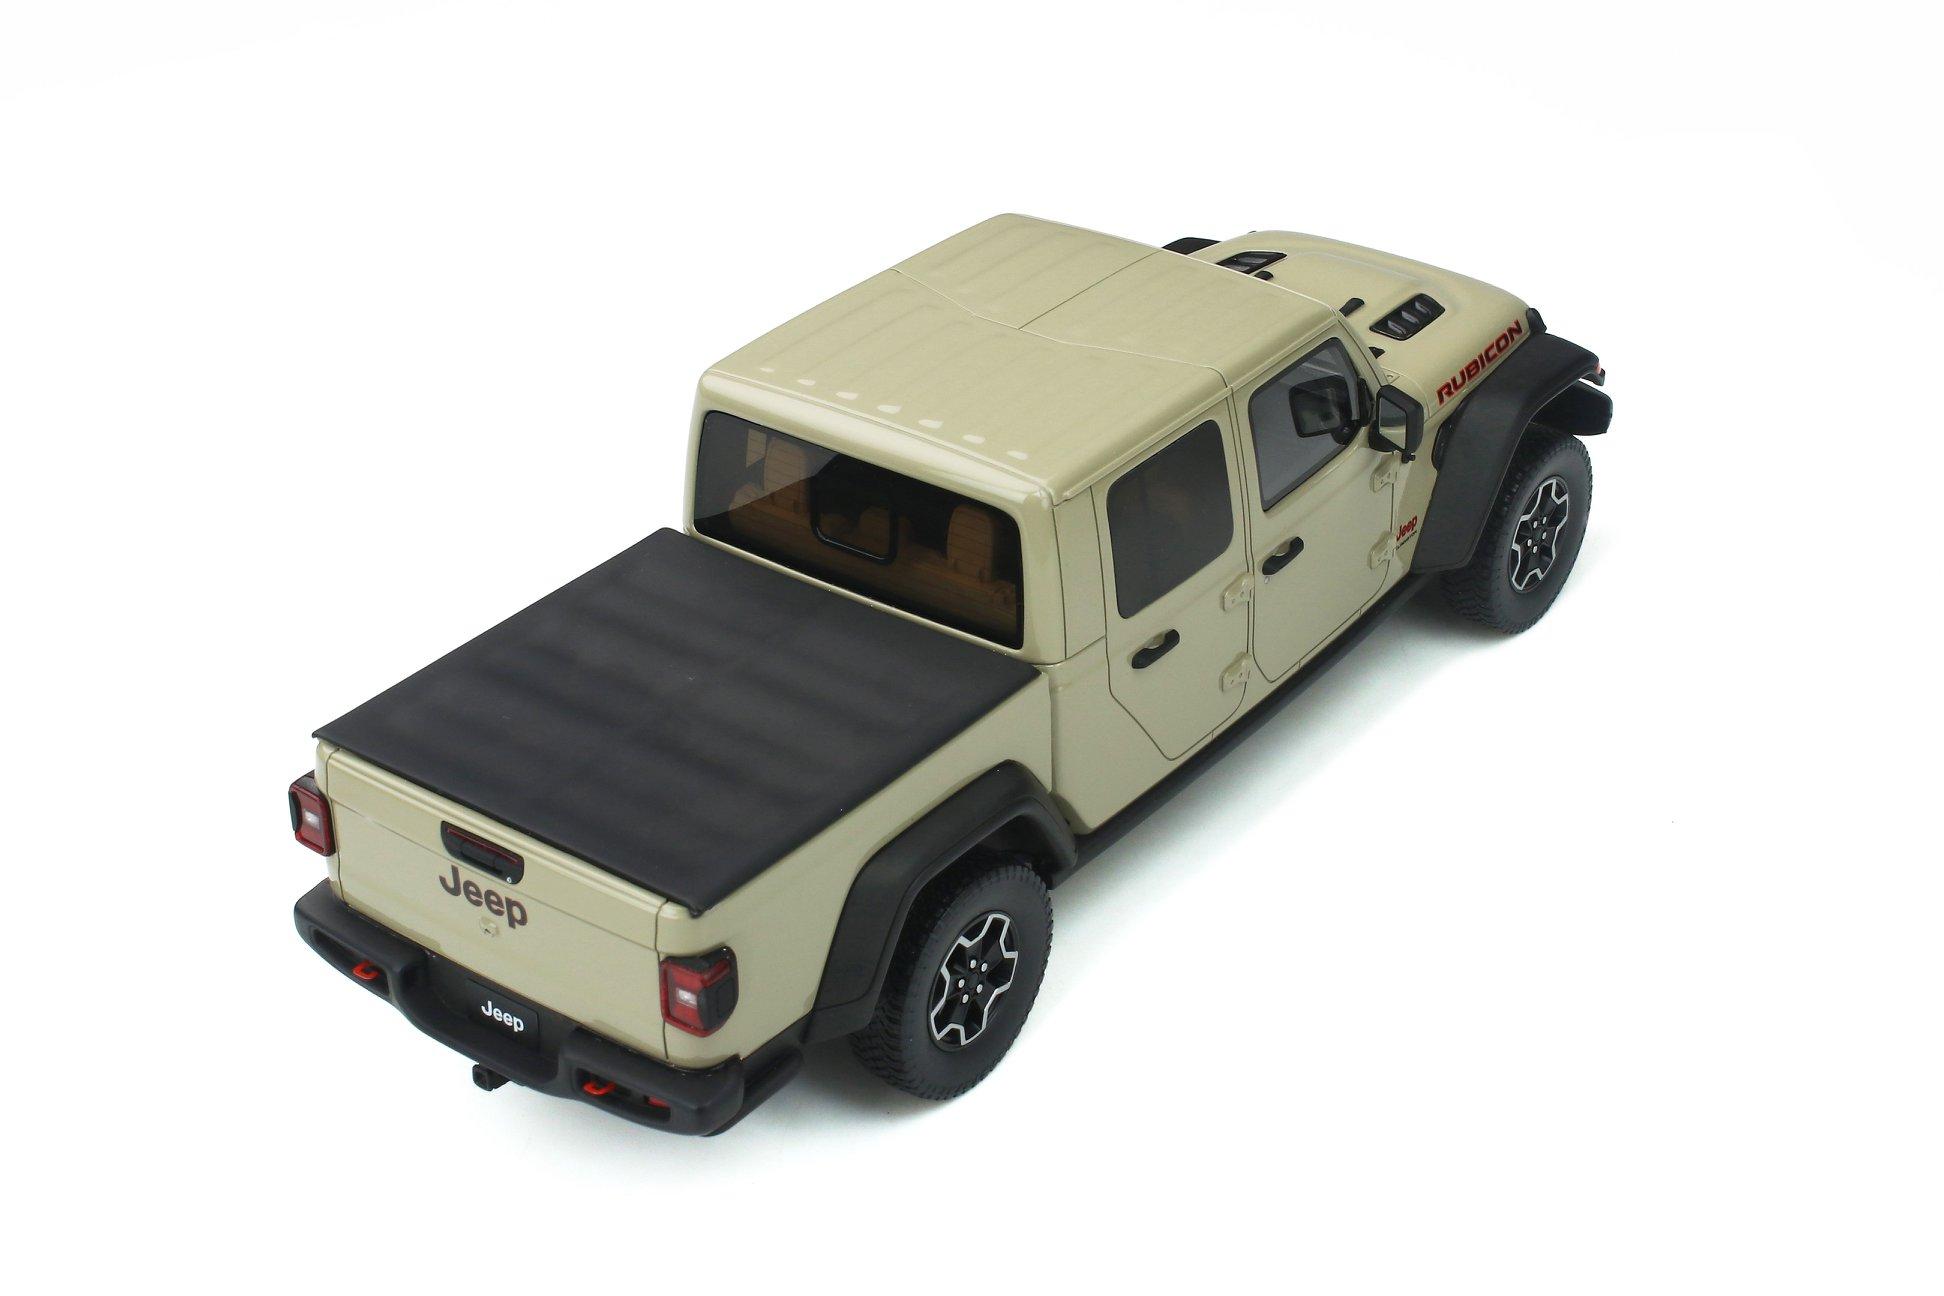 1/18 Jeep Gladiator Rubicon GT Spirit arrière